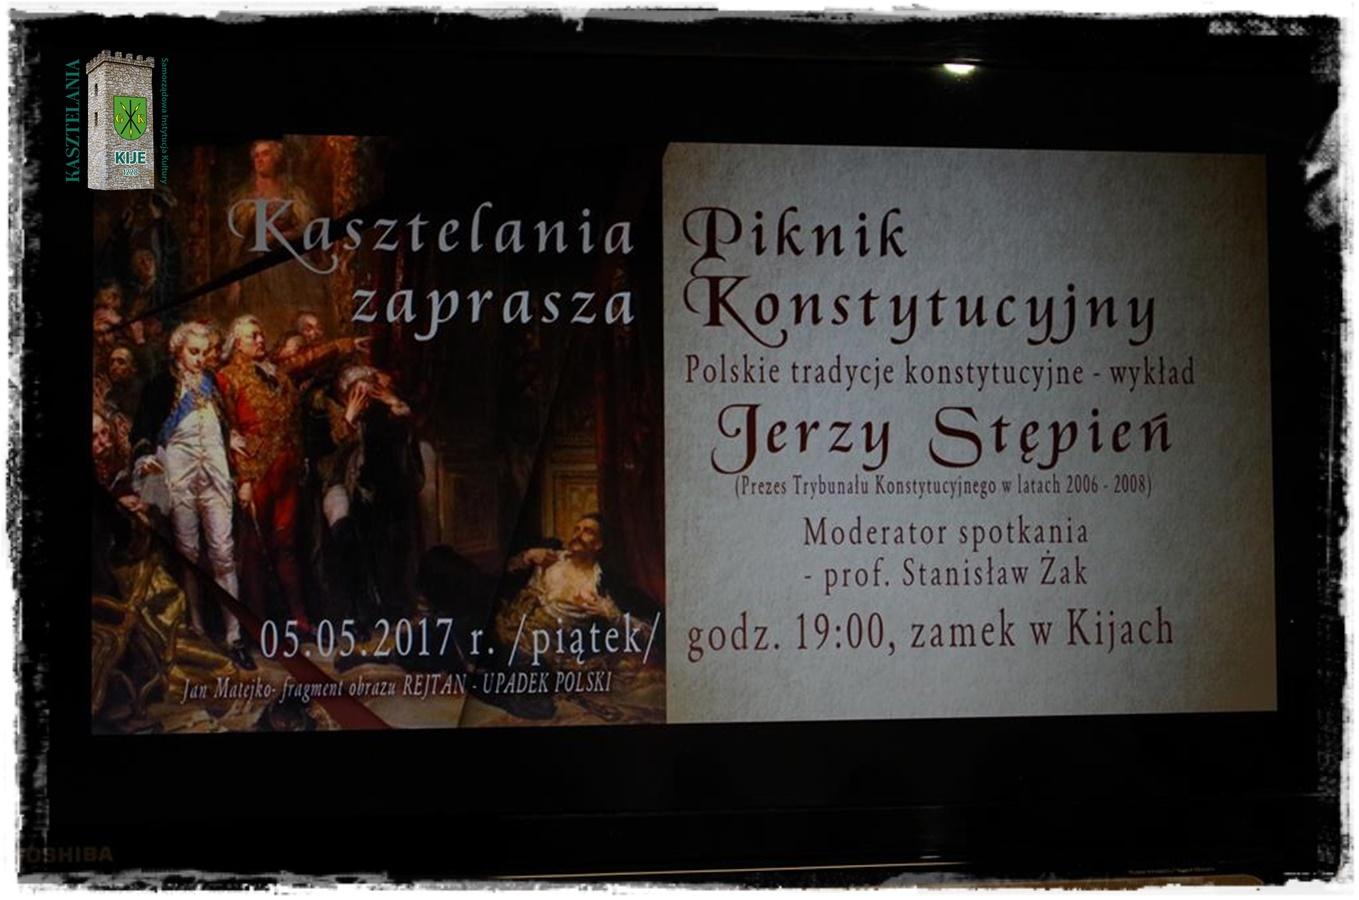 images/galleries/imprezy/2017/piknik_konstytucyjny/IMGP0581 (Copy)